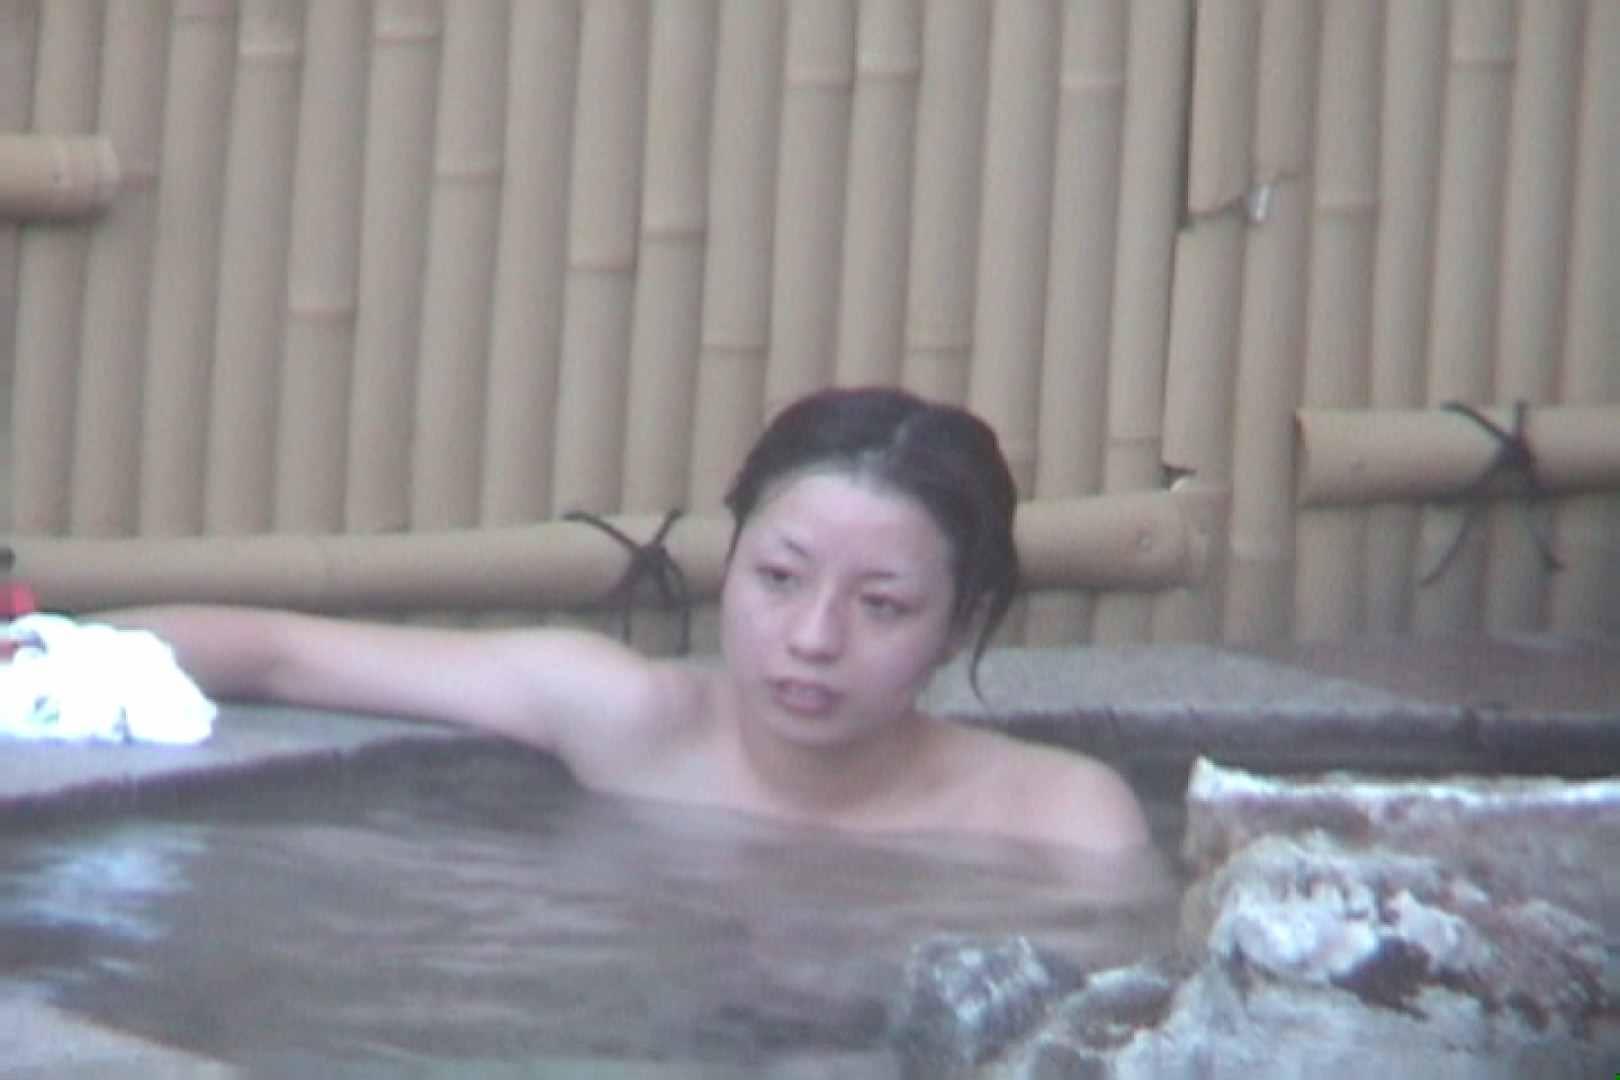 Aquaな露天風呂Vol.608 美しいOLの裸体 AV動画キャプチャ 95pic 47